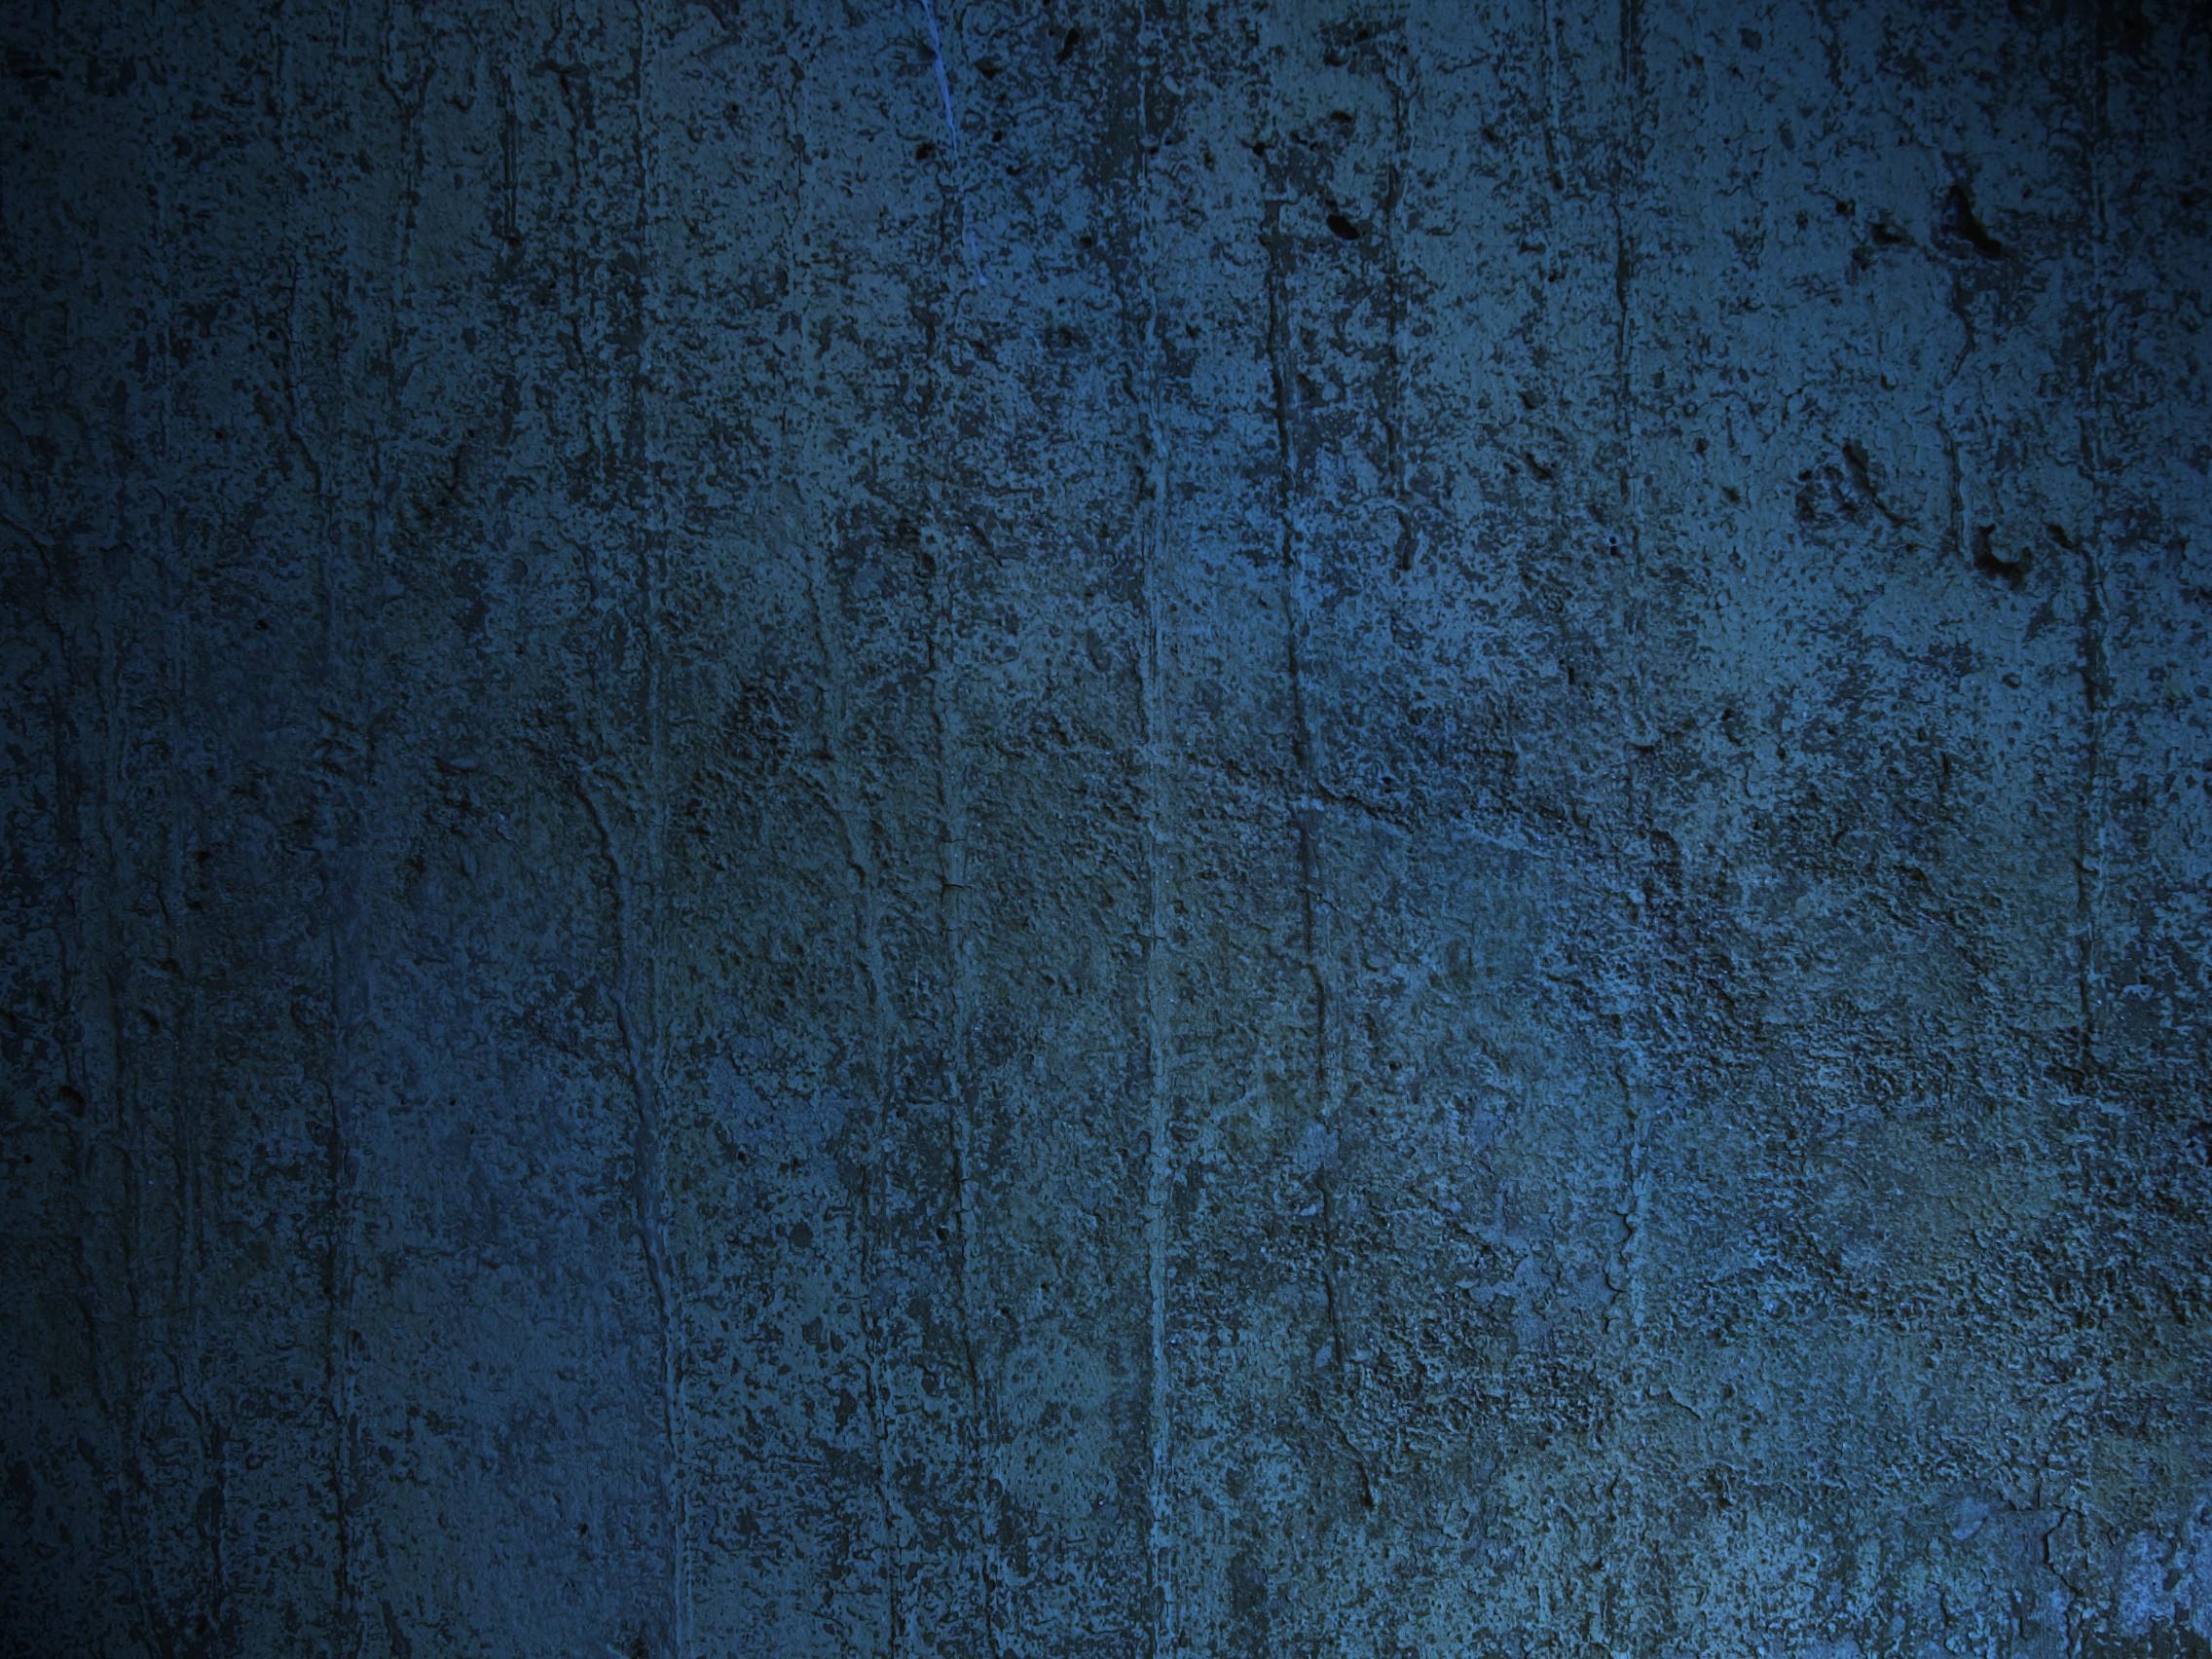 Textured Background ·① Download Free High Resolution